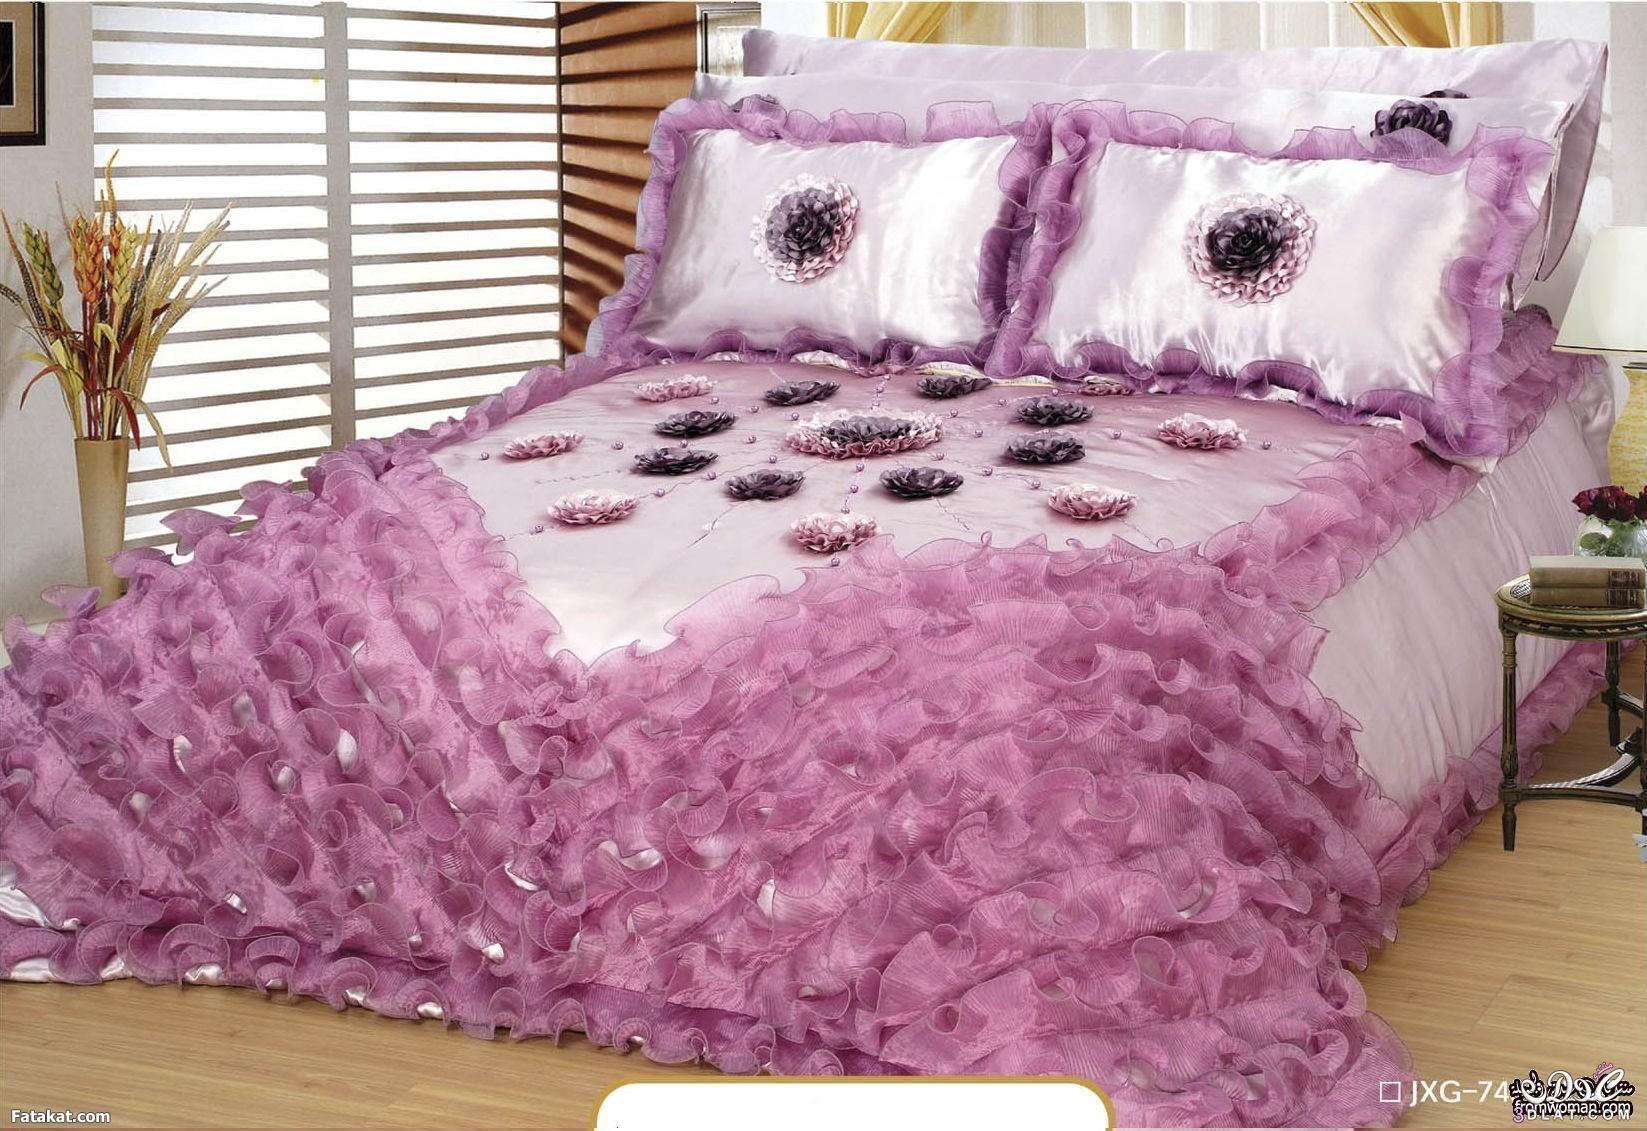 احدث مفارش سرير تركى للعرايس 2020 King Size Bed Sheets Designer Bed Sheets Luxury Bedding Sets